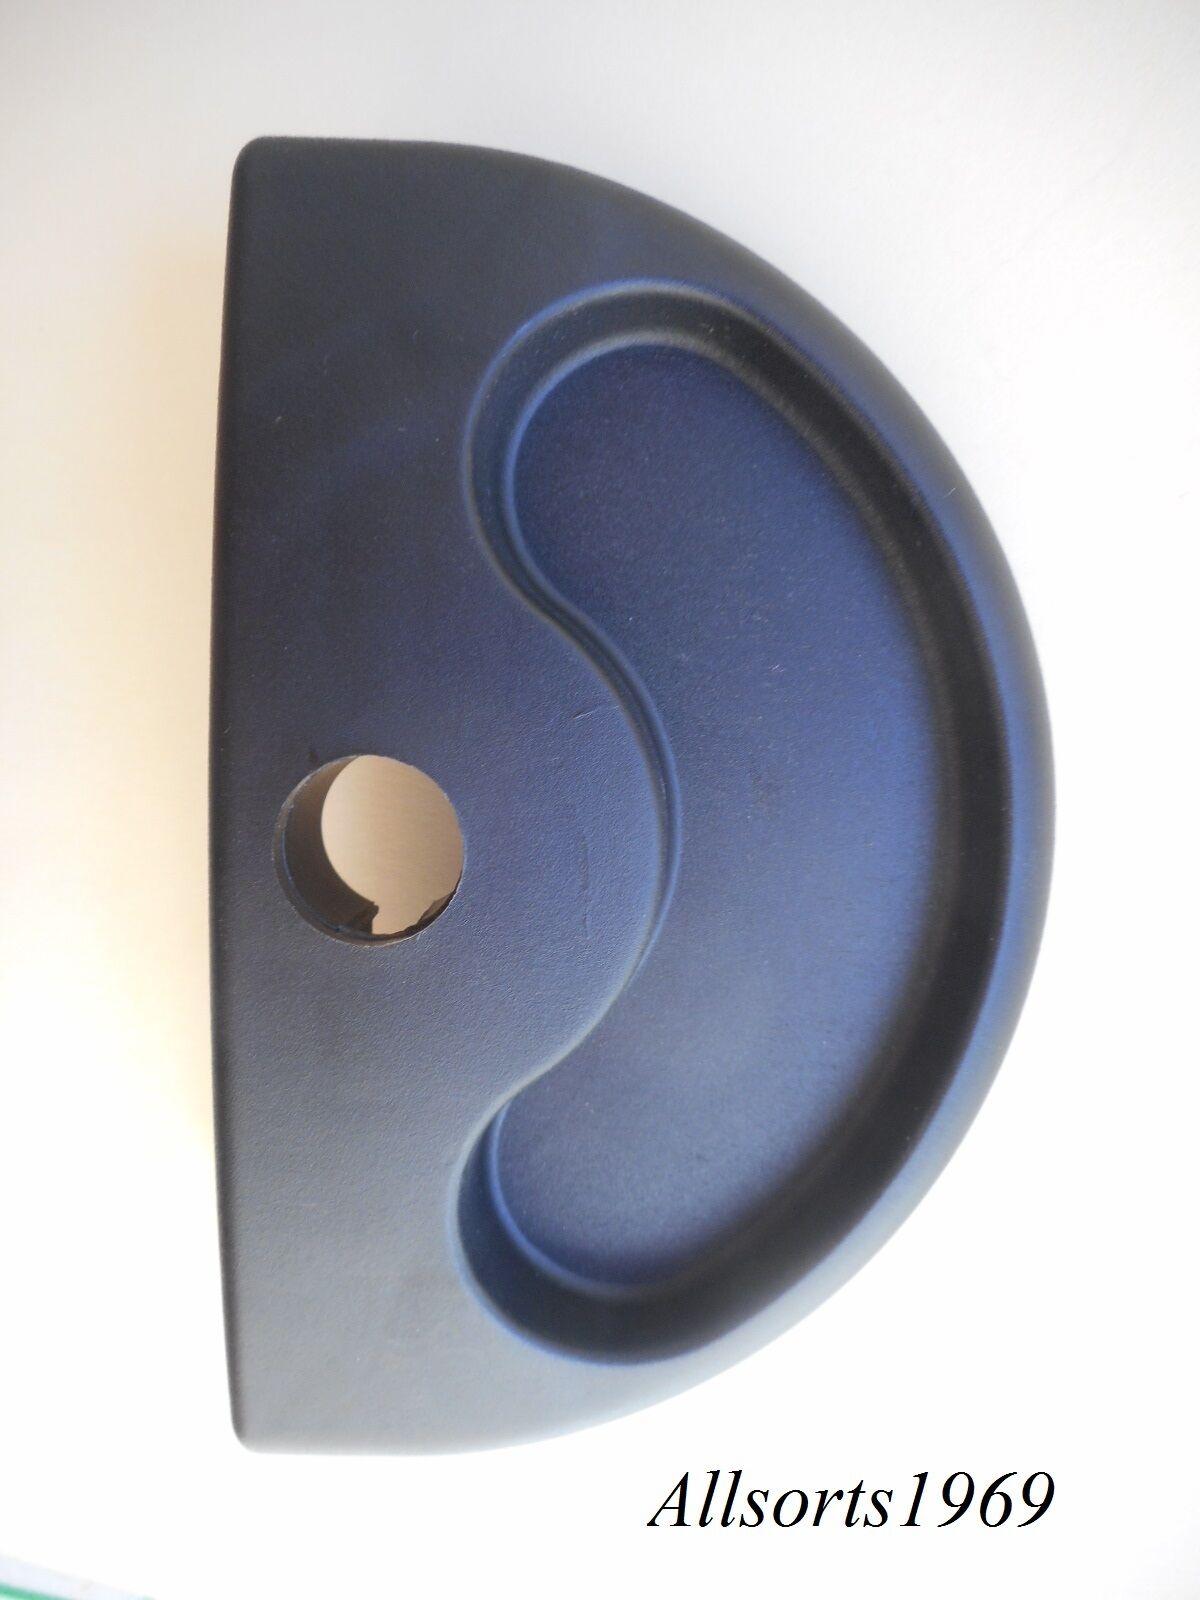 Doric Ds840 Sliding Glass Door Lock Outer Pull Handle Flush Mount